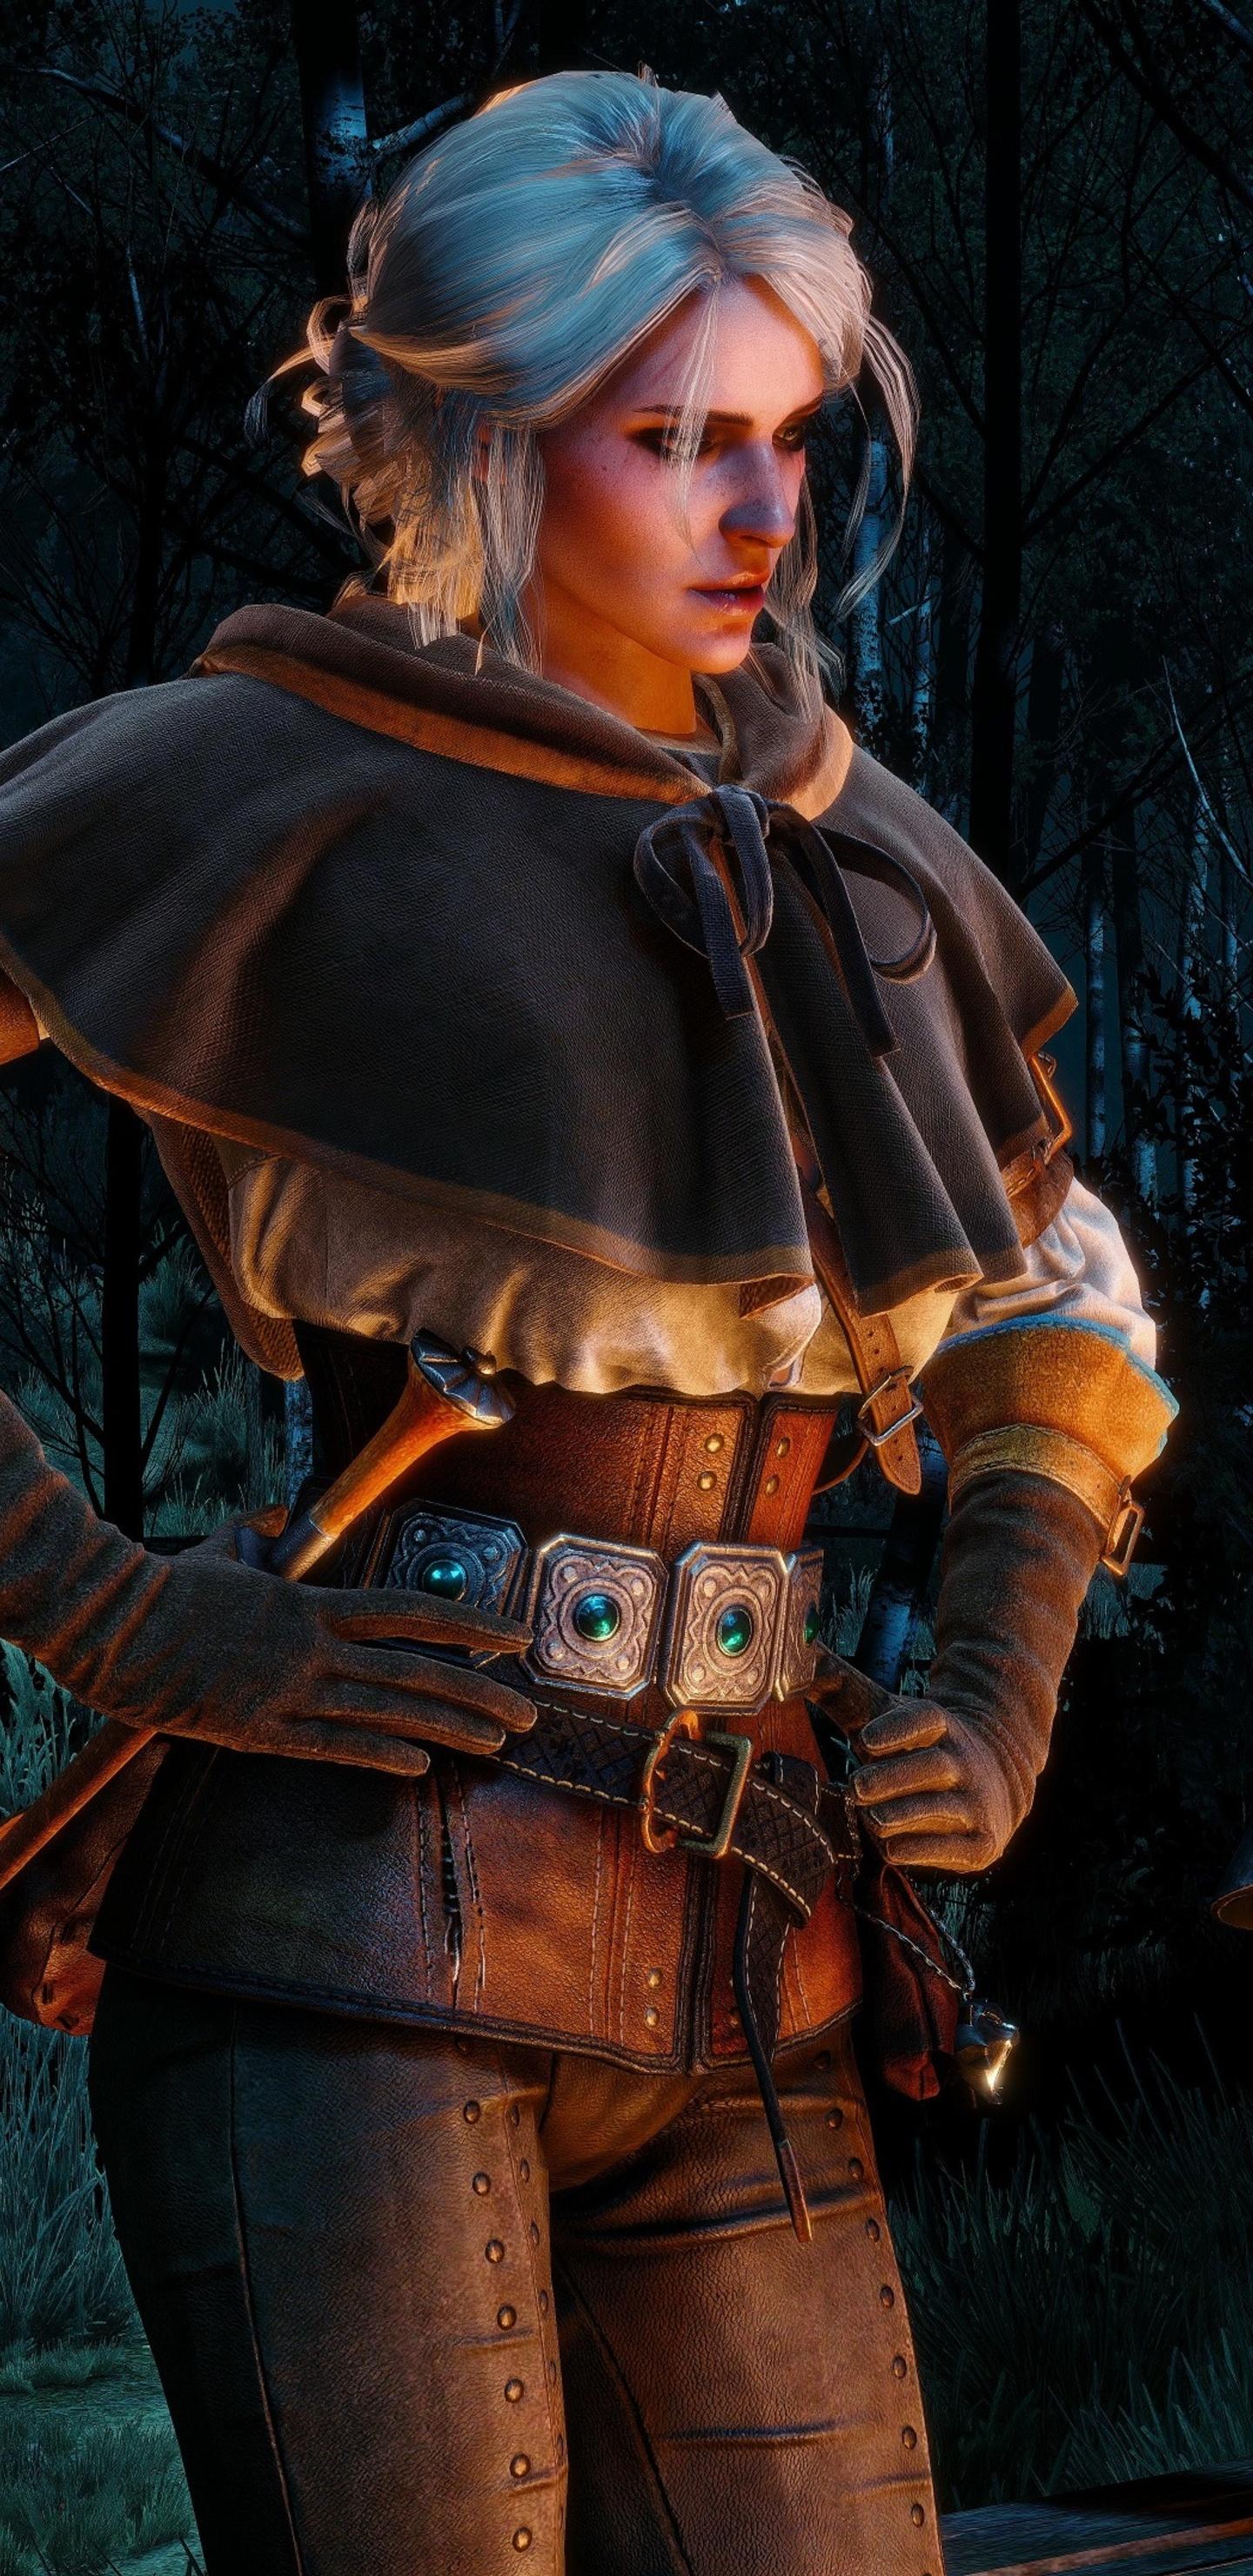 the-witcher-3-wild-hunt-2020-4k-b4.jpg